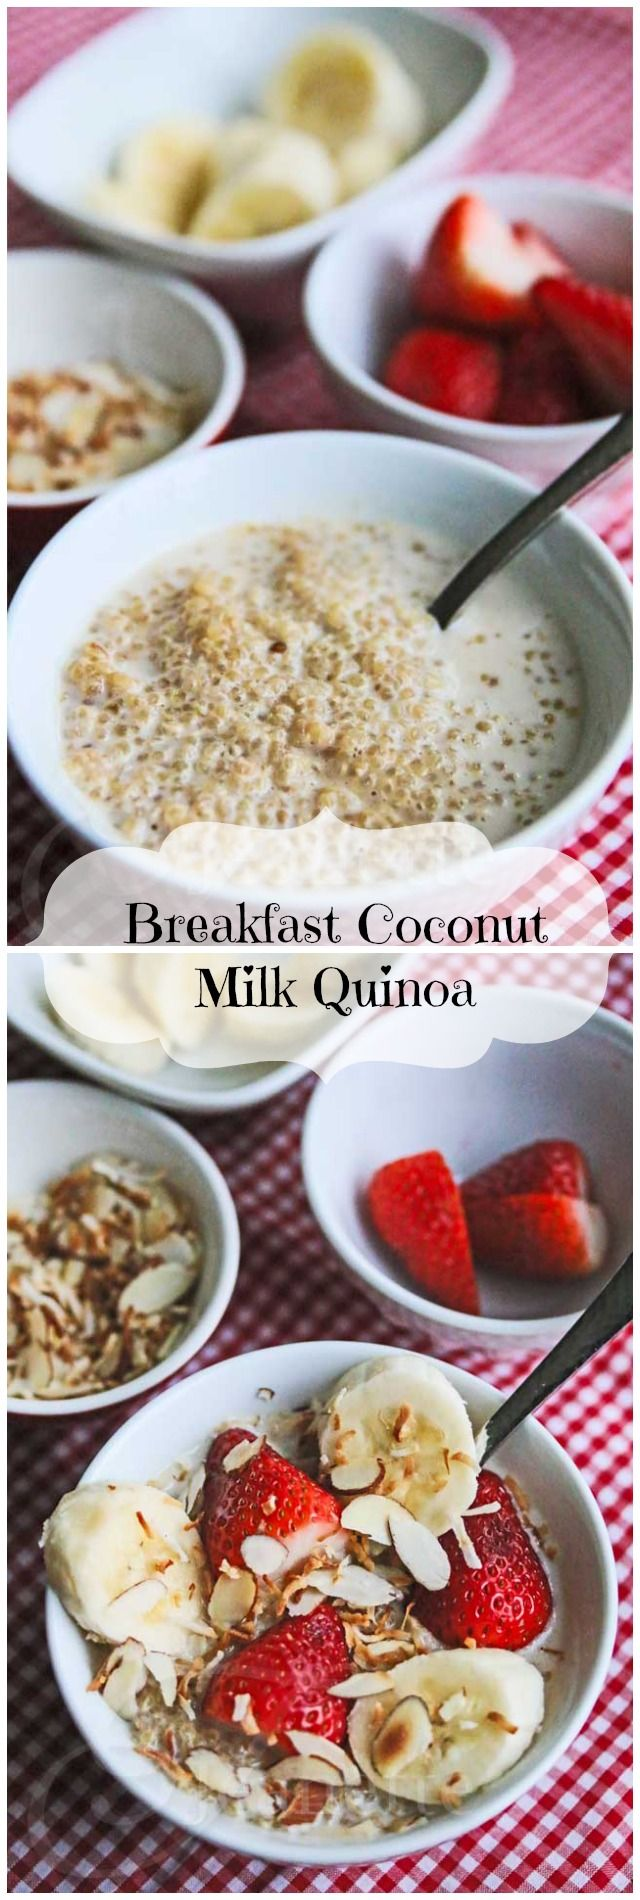 Breakfast Coconut Milk Quinoa with Fresh Fruit © Jeanette's Healthy Living